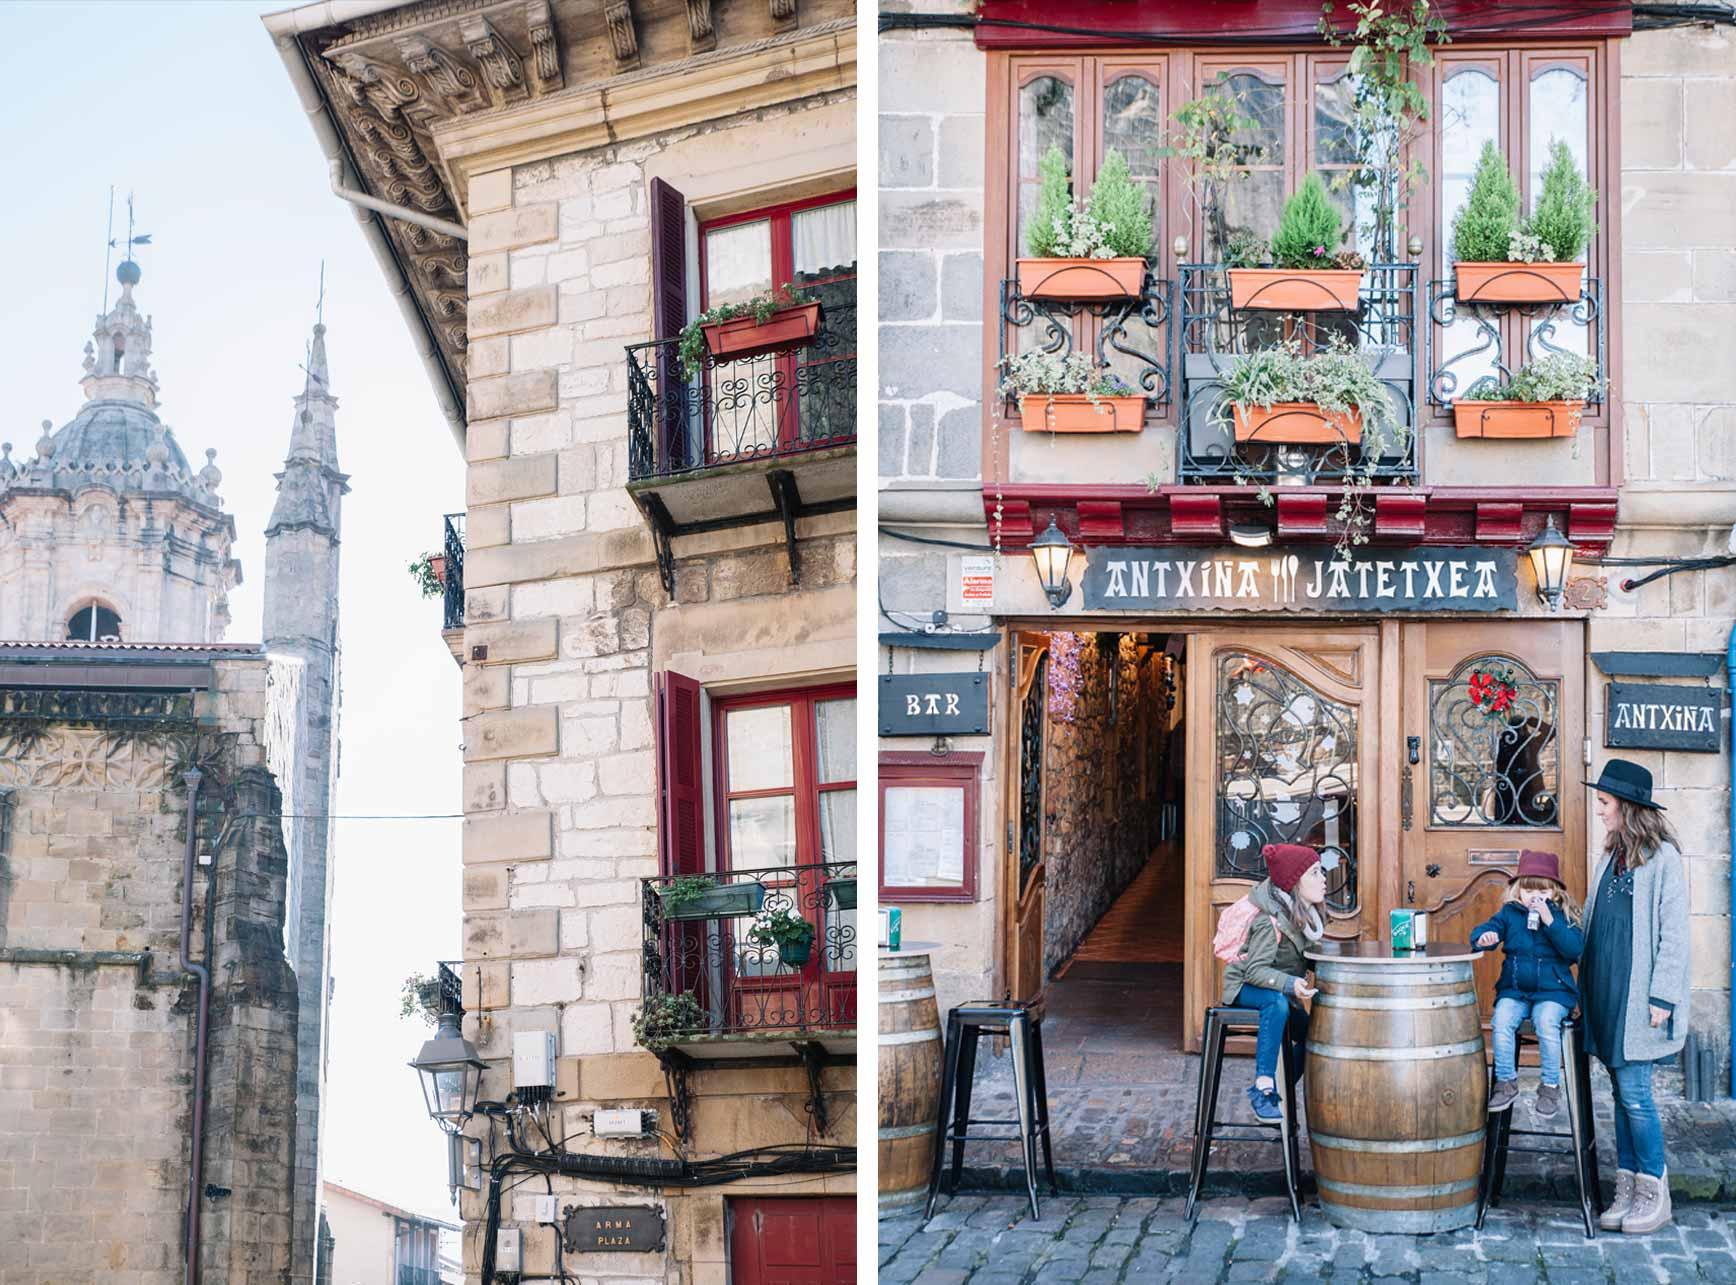 Pueblos con encanto en Pais Vasco - Hondarribia